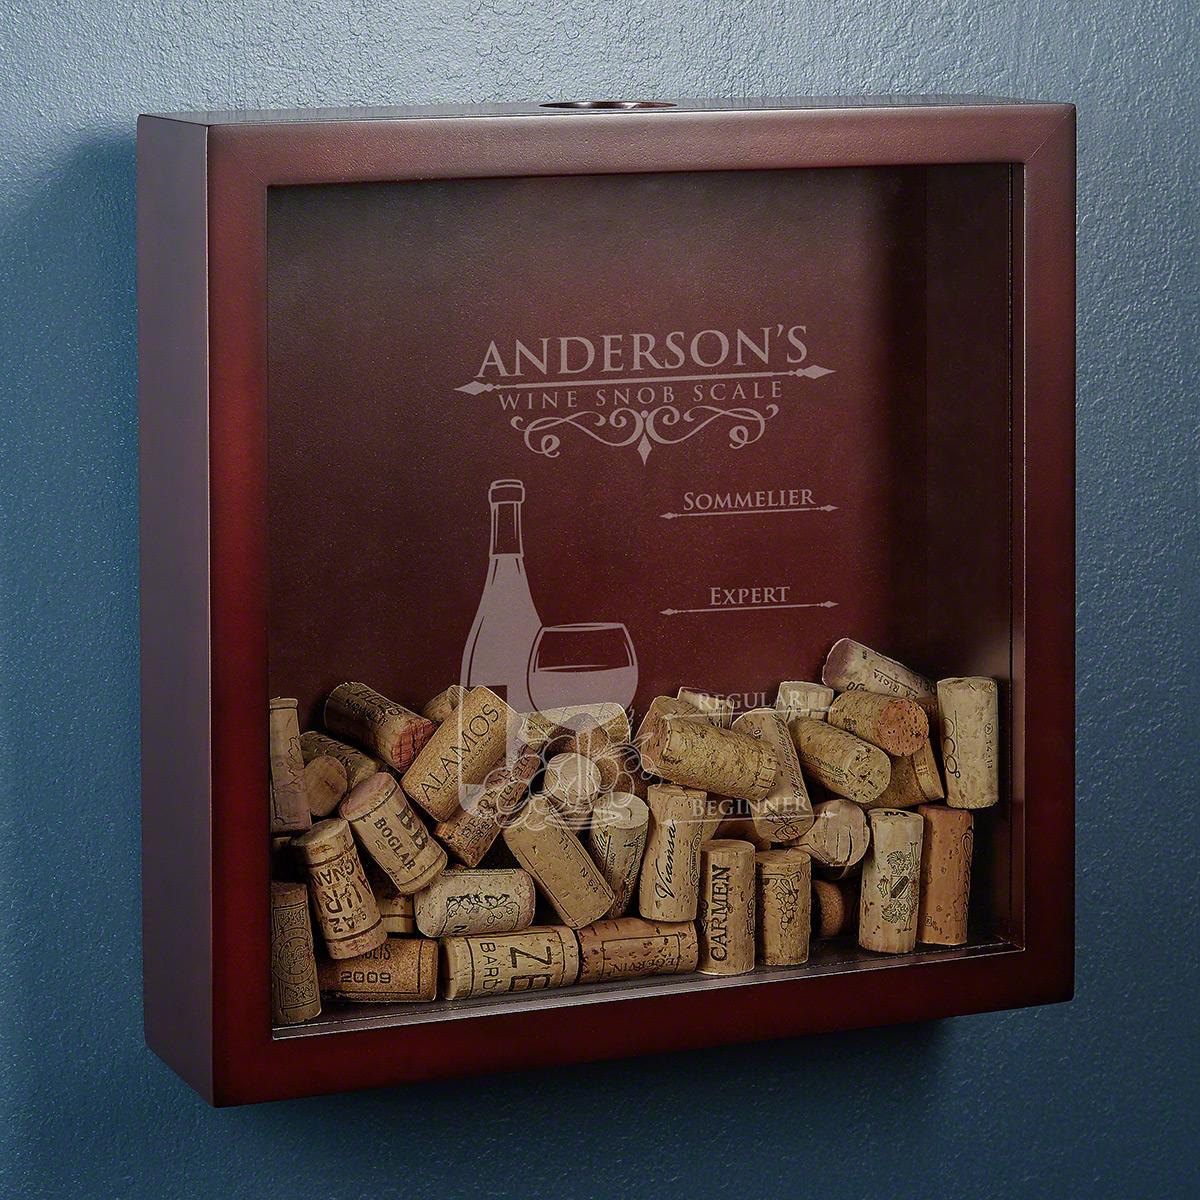 Wine Snob Scale Personalized Wine Cork Keeper